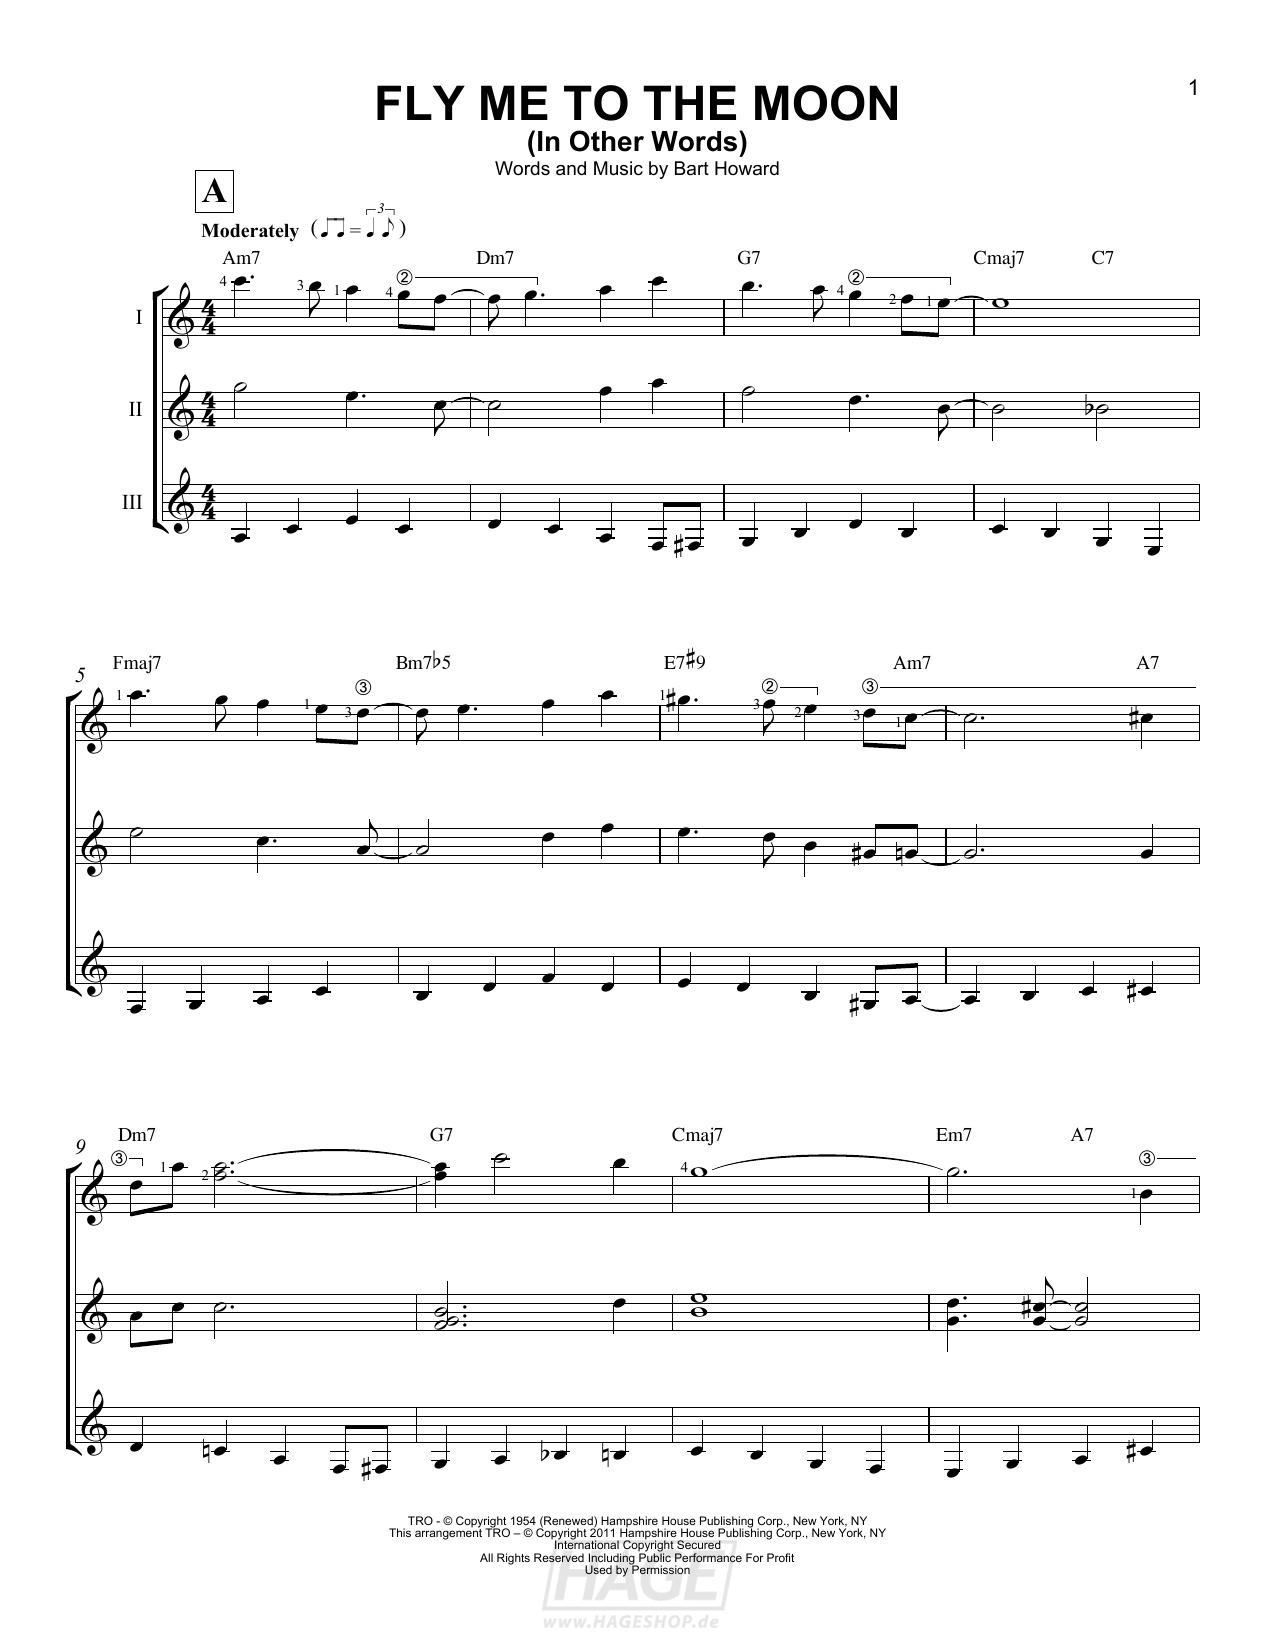 Fly Me To The Moon (In Other Words) - Frank Sinatra - Noten Druckvorschau